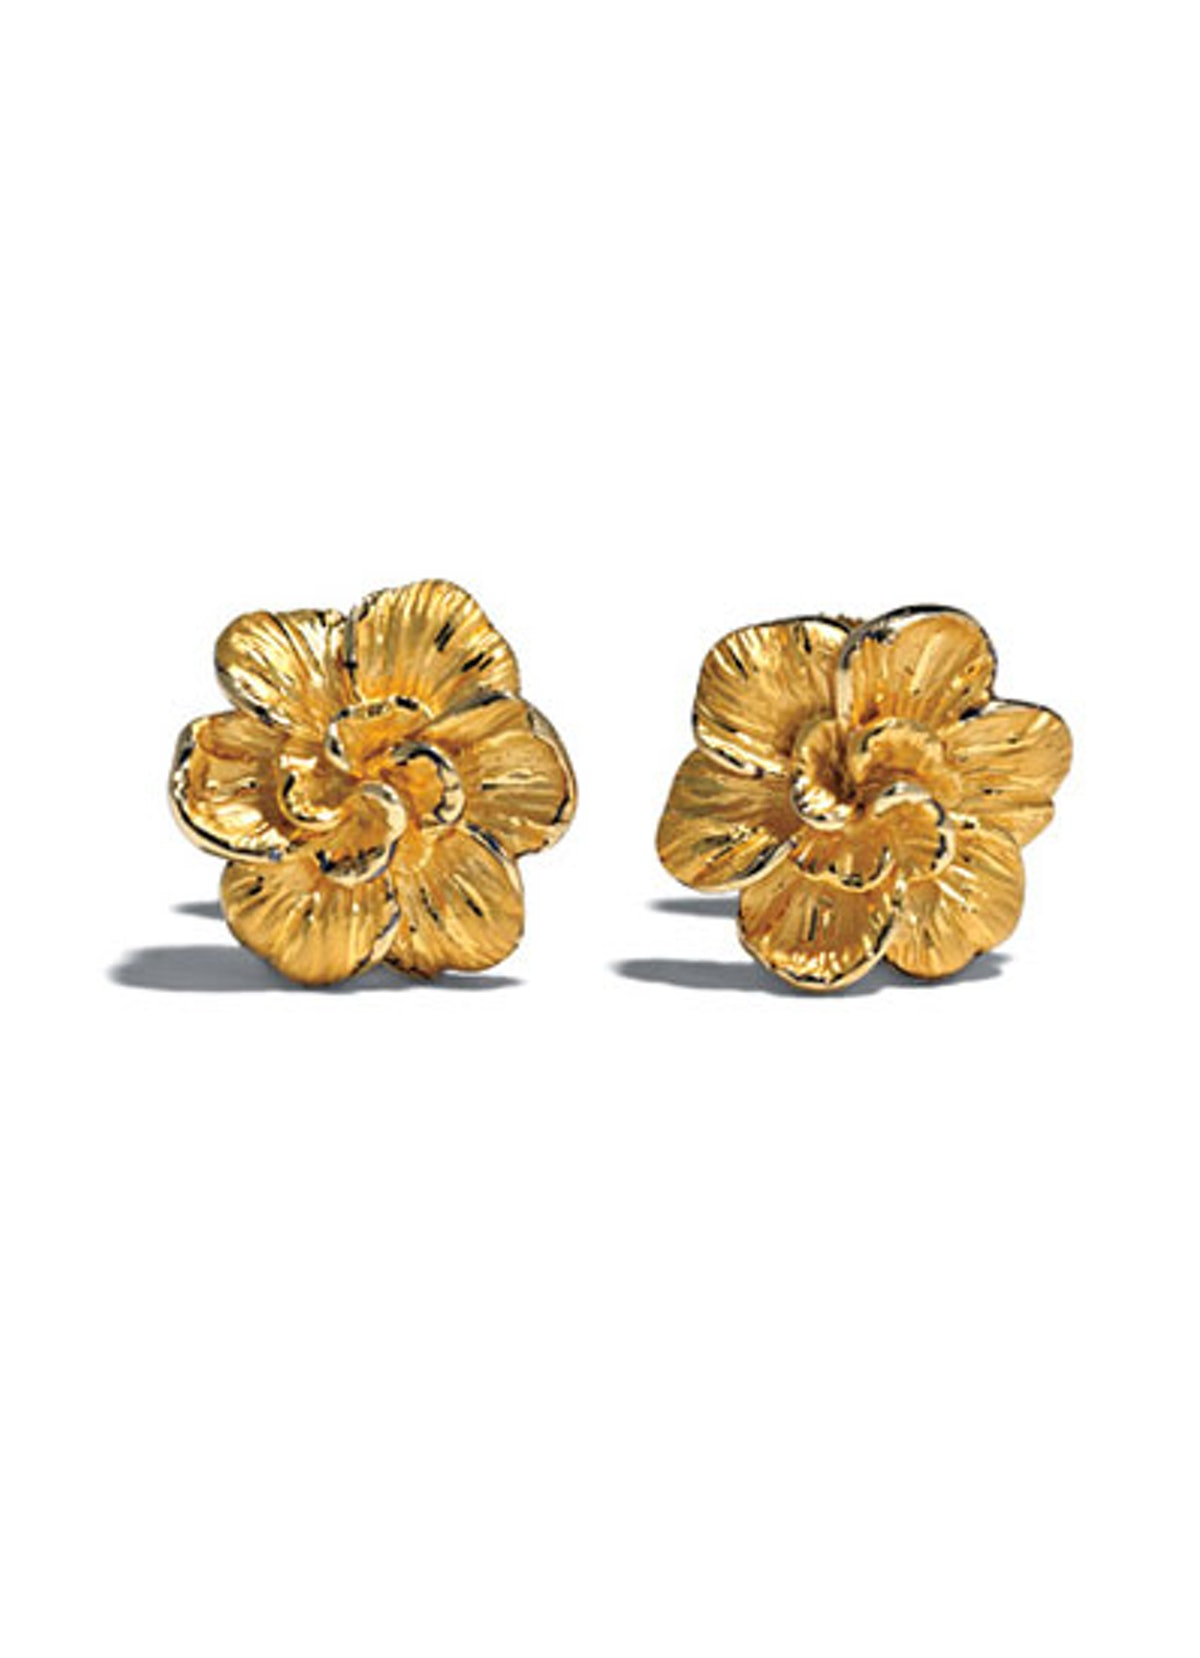 fass-gift-guide-florals-15-v.jpg